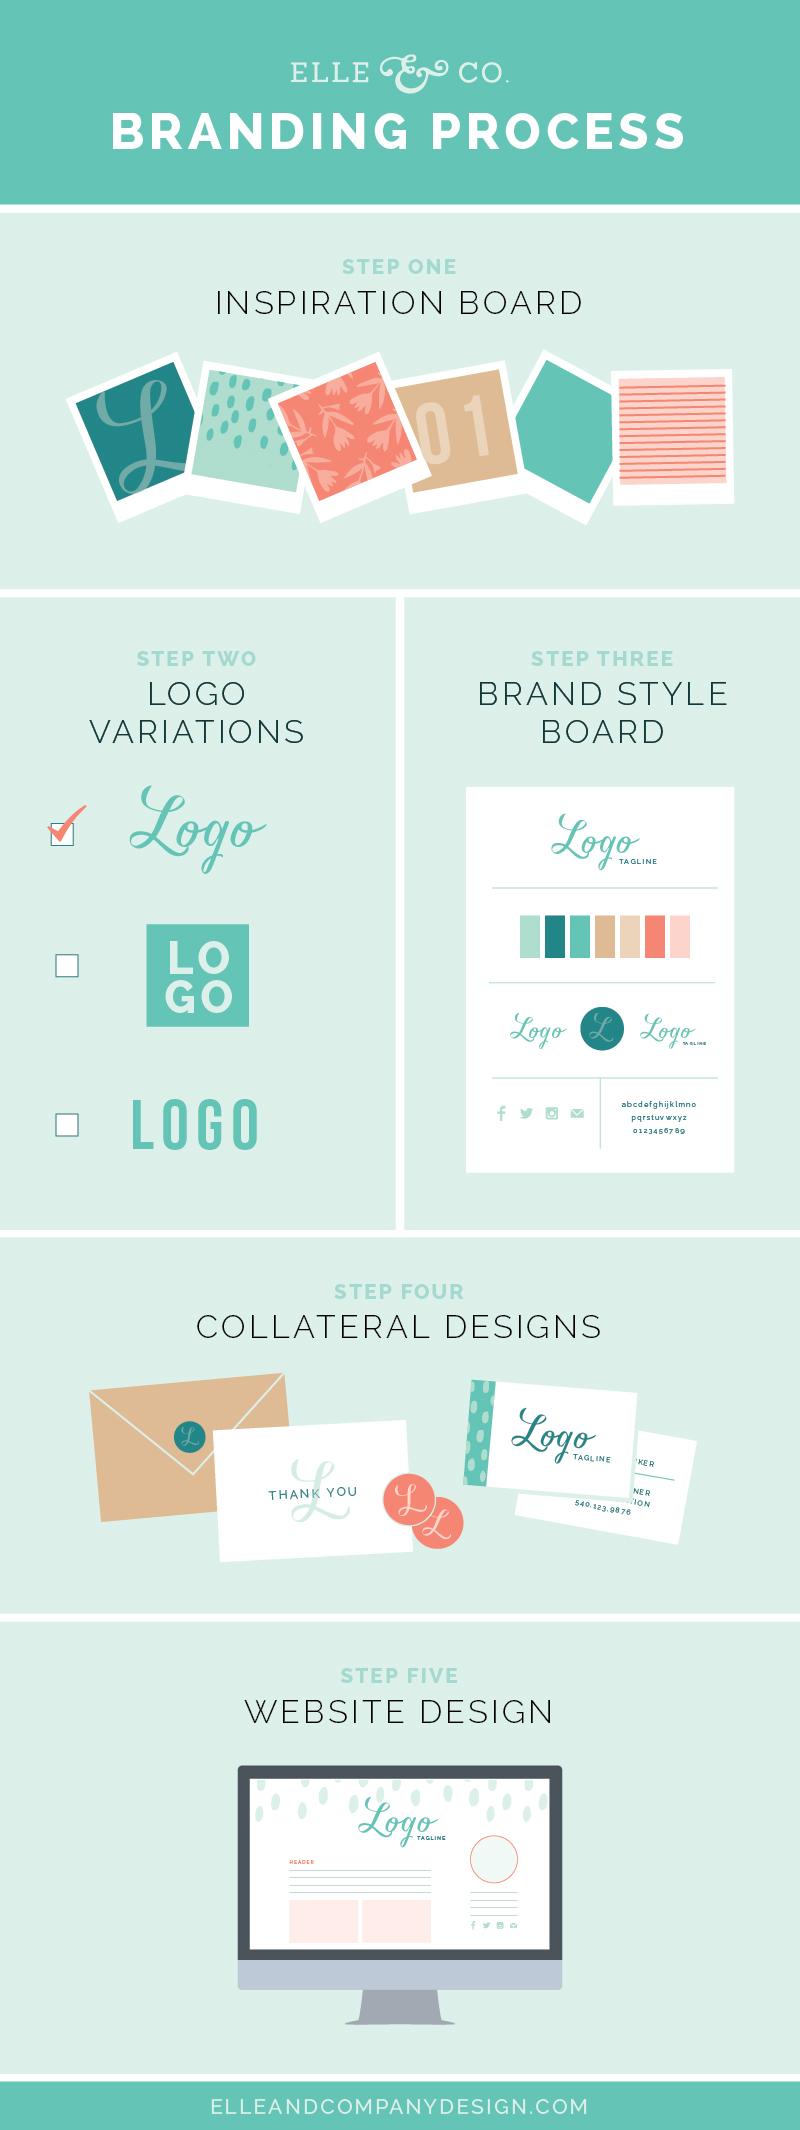 Elle & Company Branding Process | Elle & Company